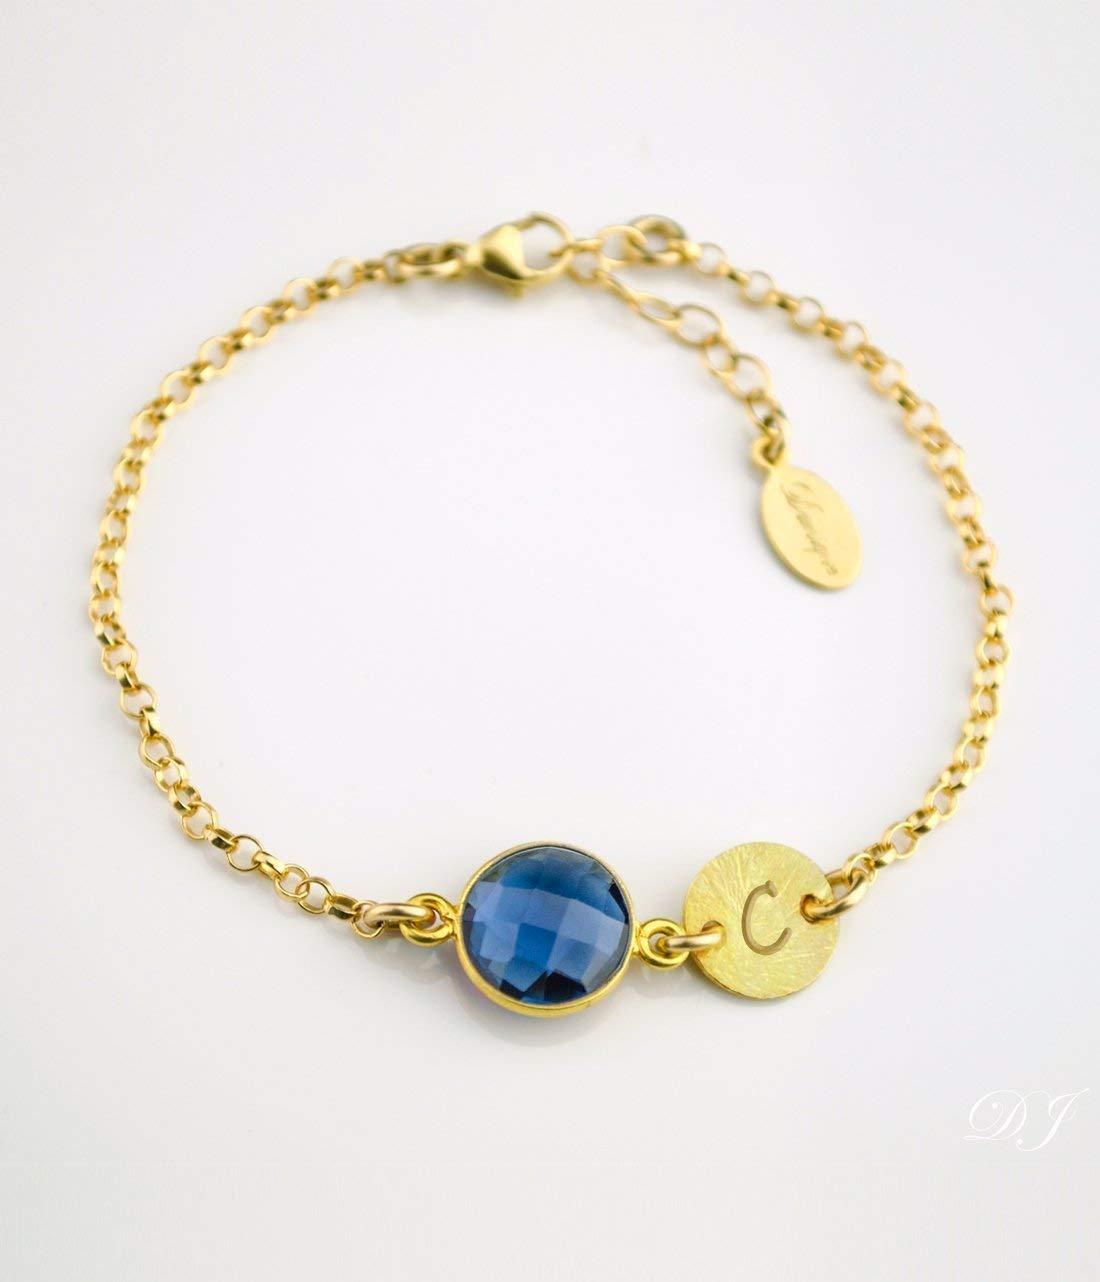 September Birthstone Max 64% OFF Bracelet - Personalized bracelet Kyanite Soldering